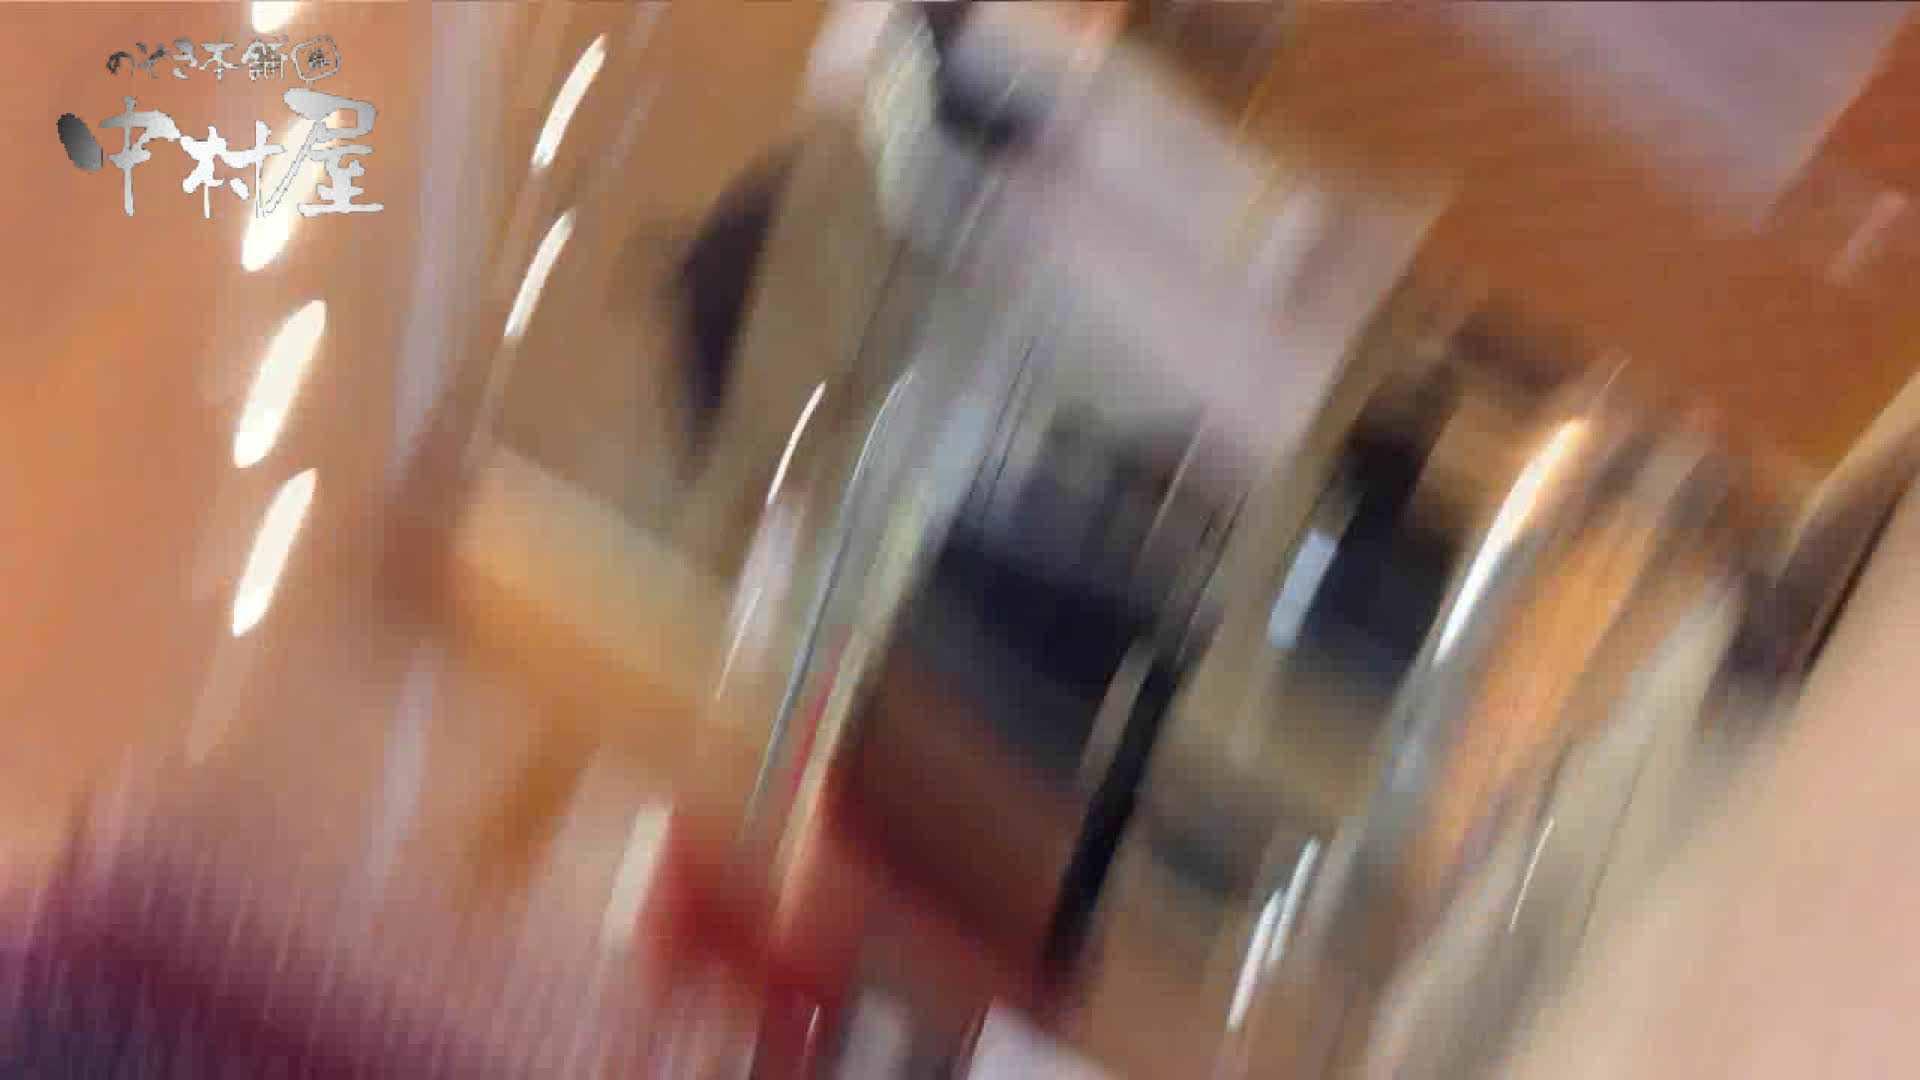 vol.48可愛いカリスマ店員胸チラ&パンチラ アニメ声の店員さん 胸チラ  96Pix 22